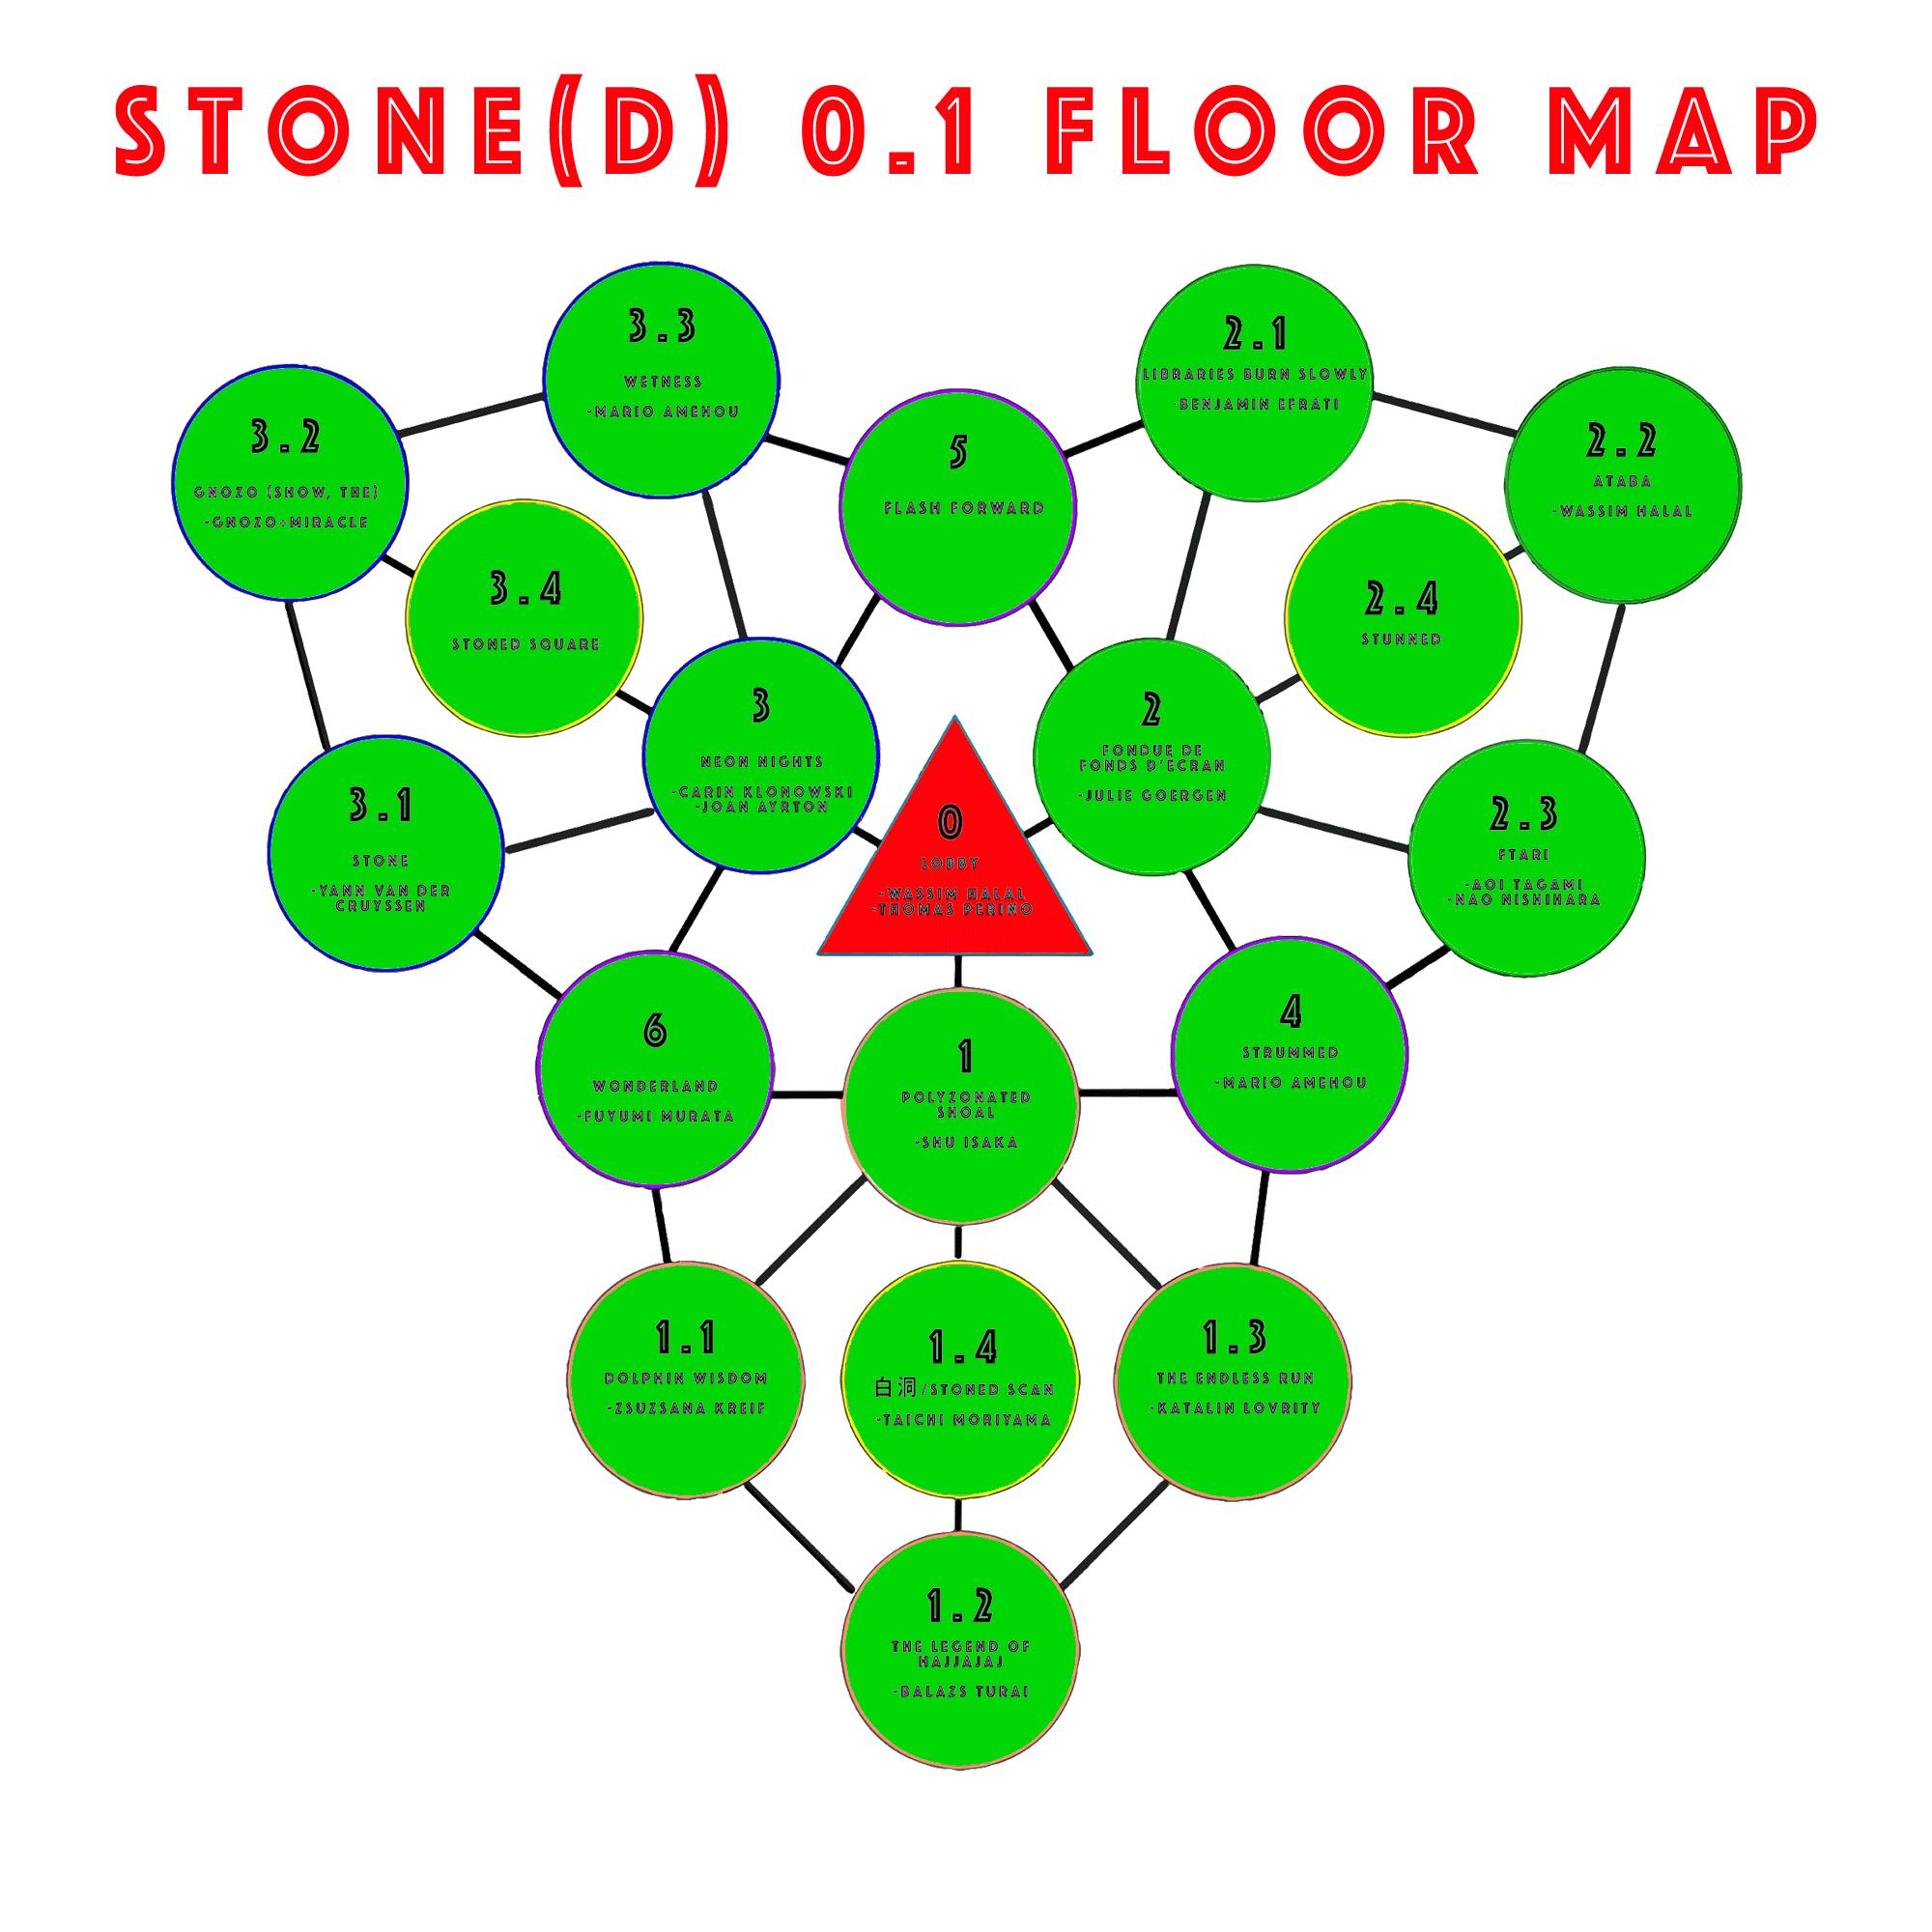 Stoned 0.1